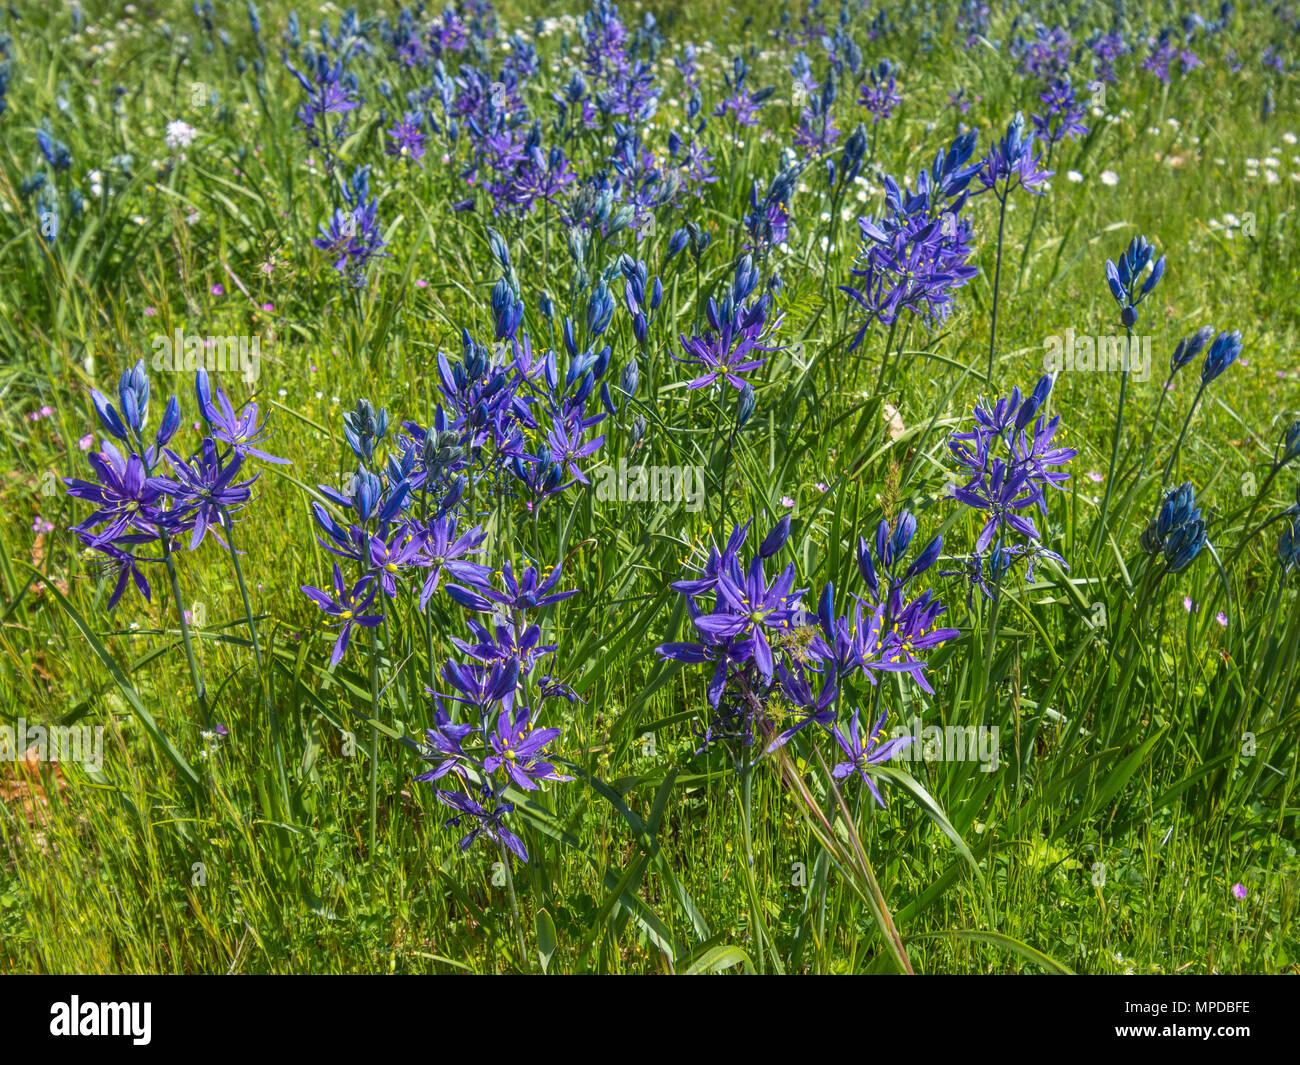 Camas - Camassia quamash - plant in flower, Hornby Island, BC, Canada. - Stock Image